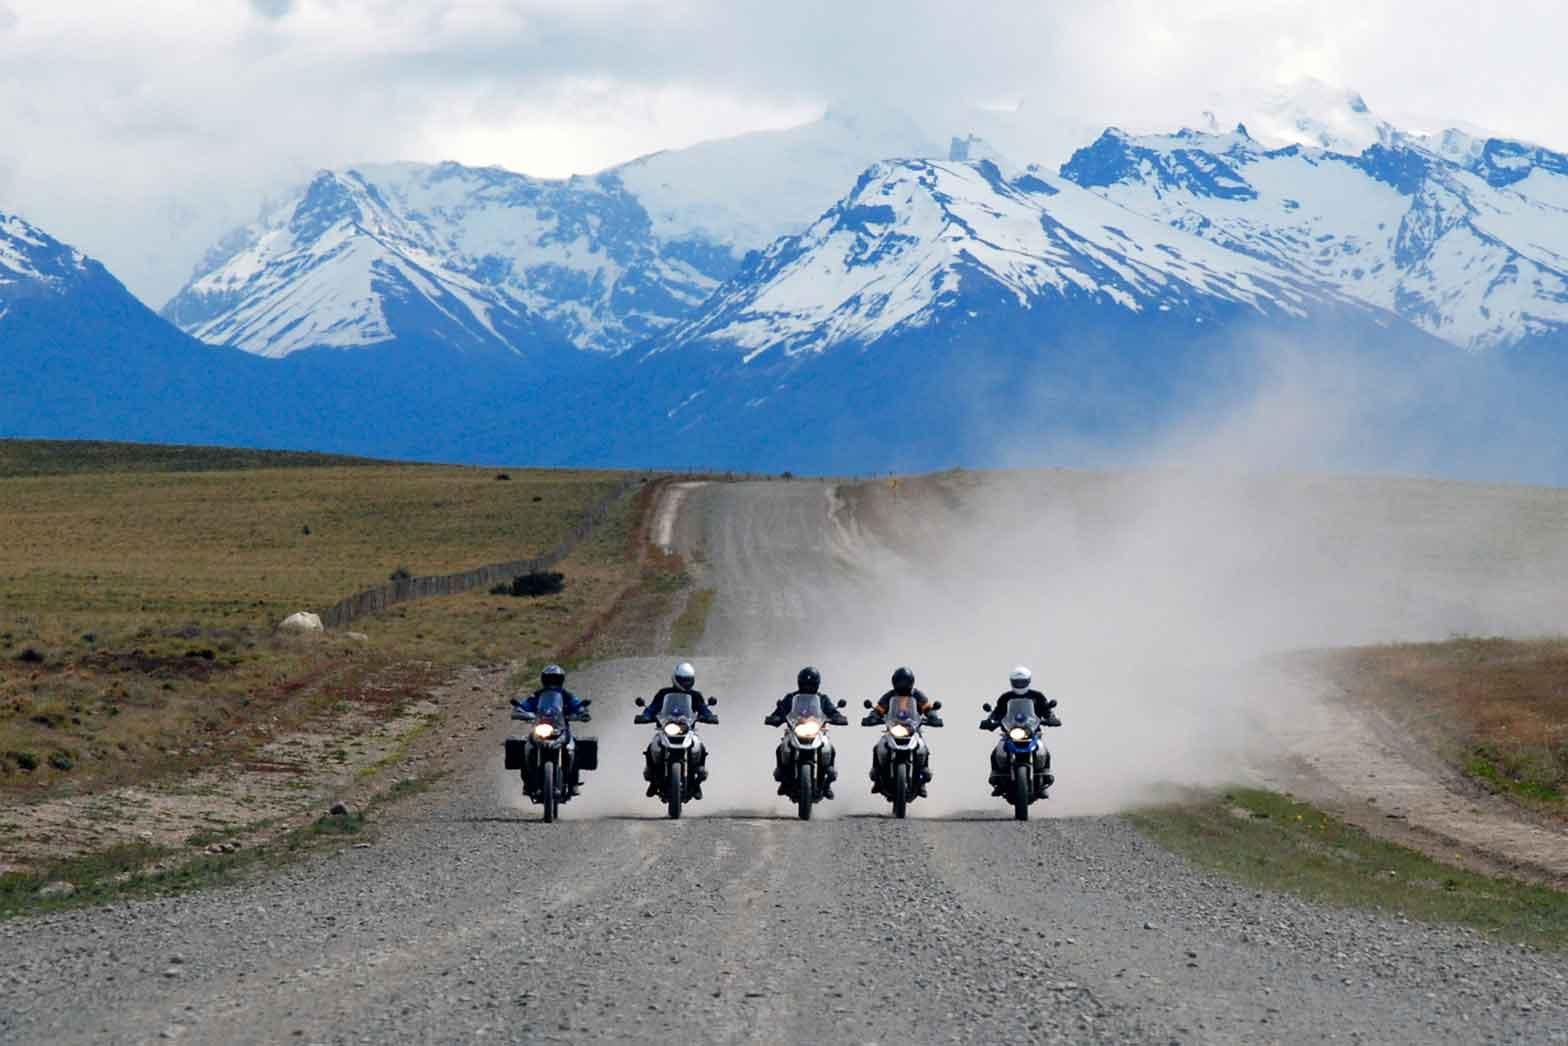 Patagonian Riders